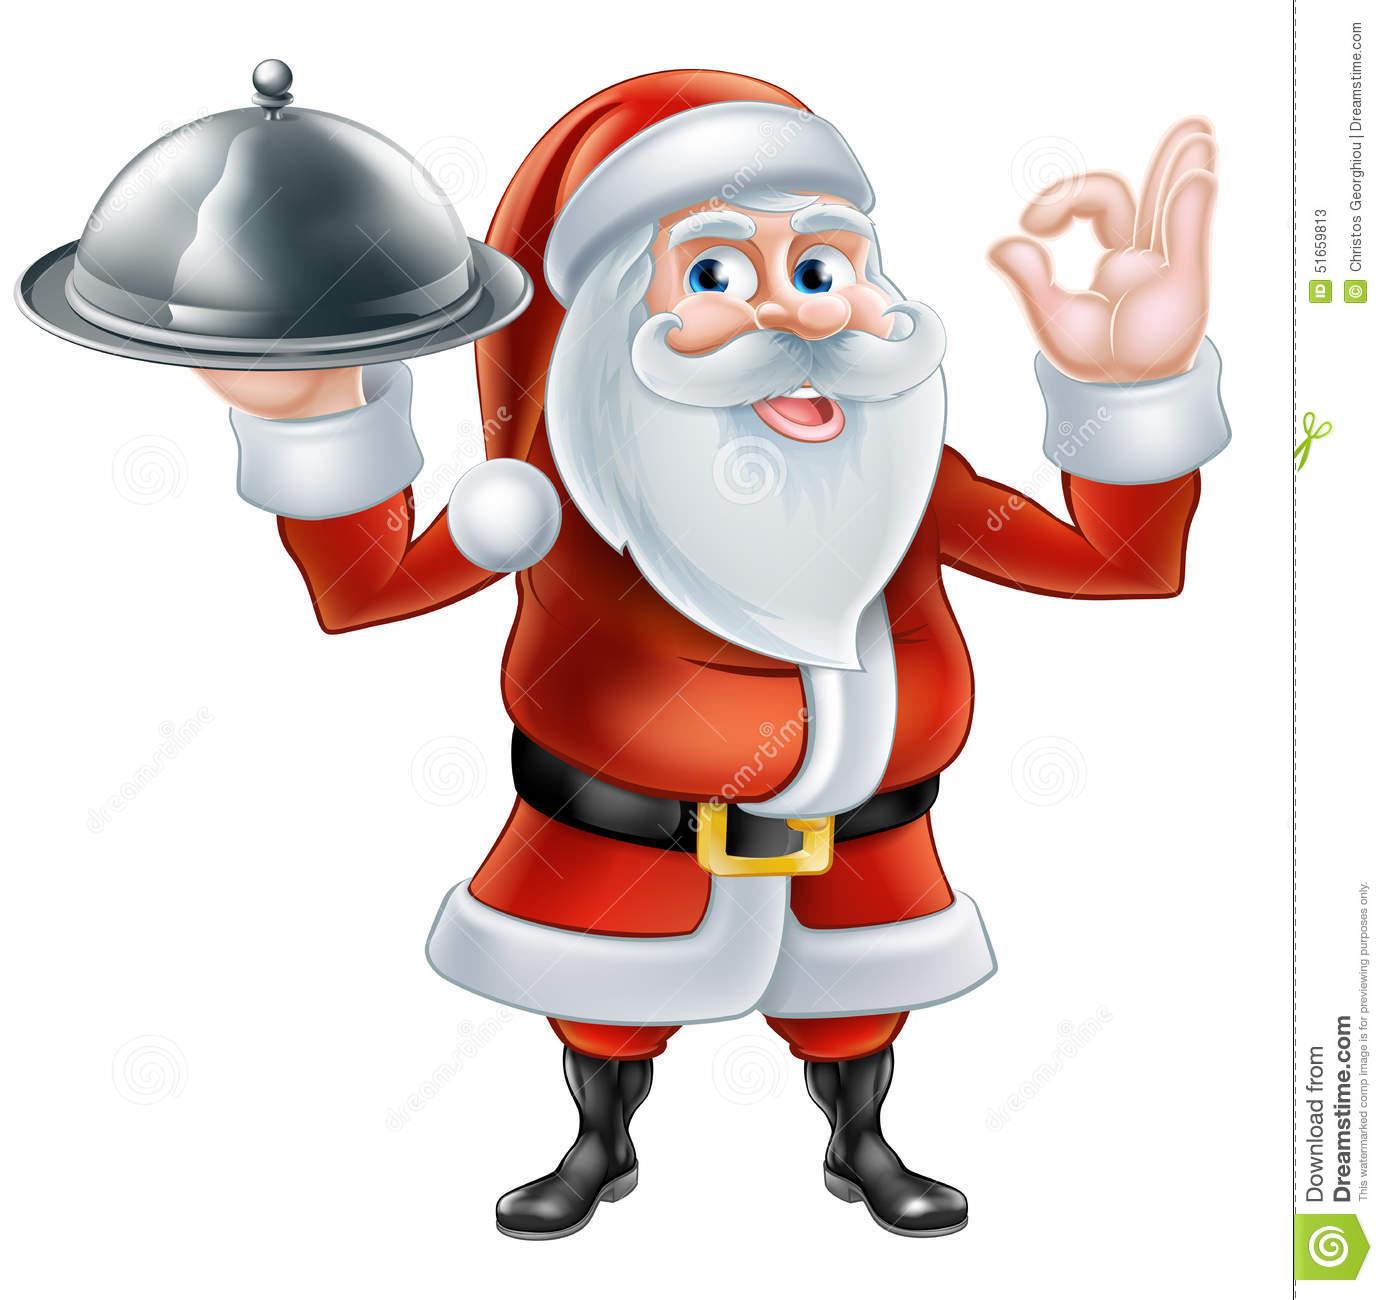 Santa eating pizza clipart picture transparent stock Cartoon Santa Claus Holding Pizza Stock Ve #129611 ... picture transparent stock